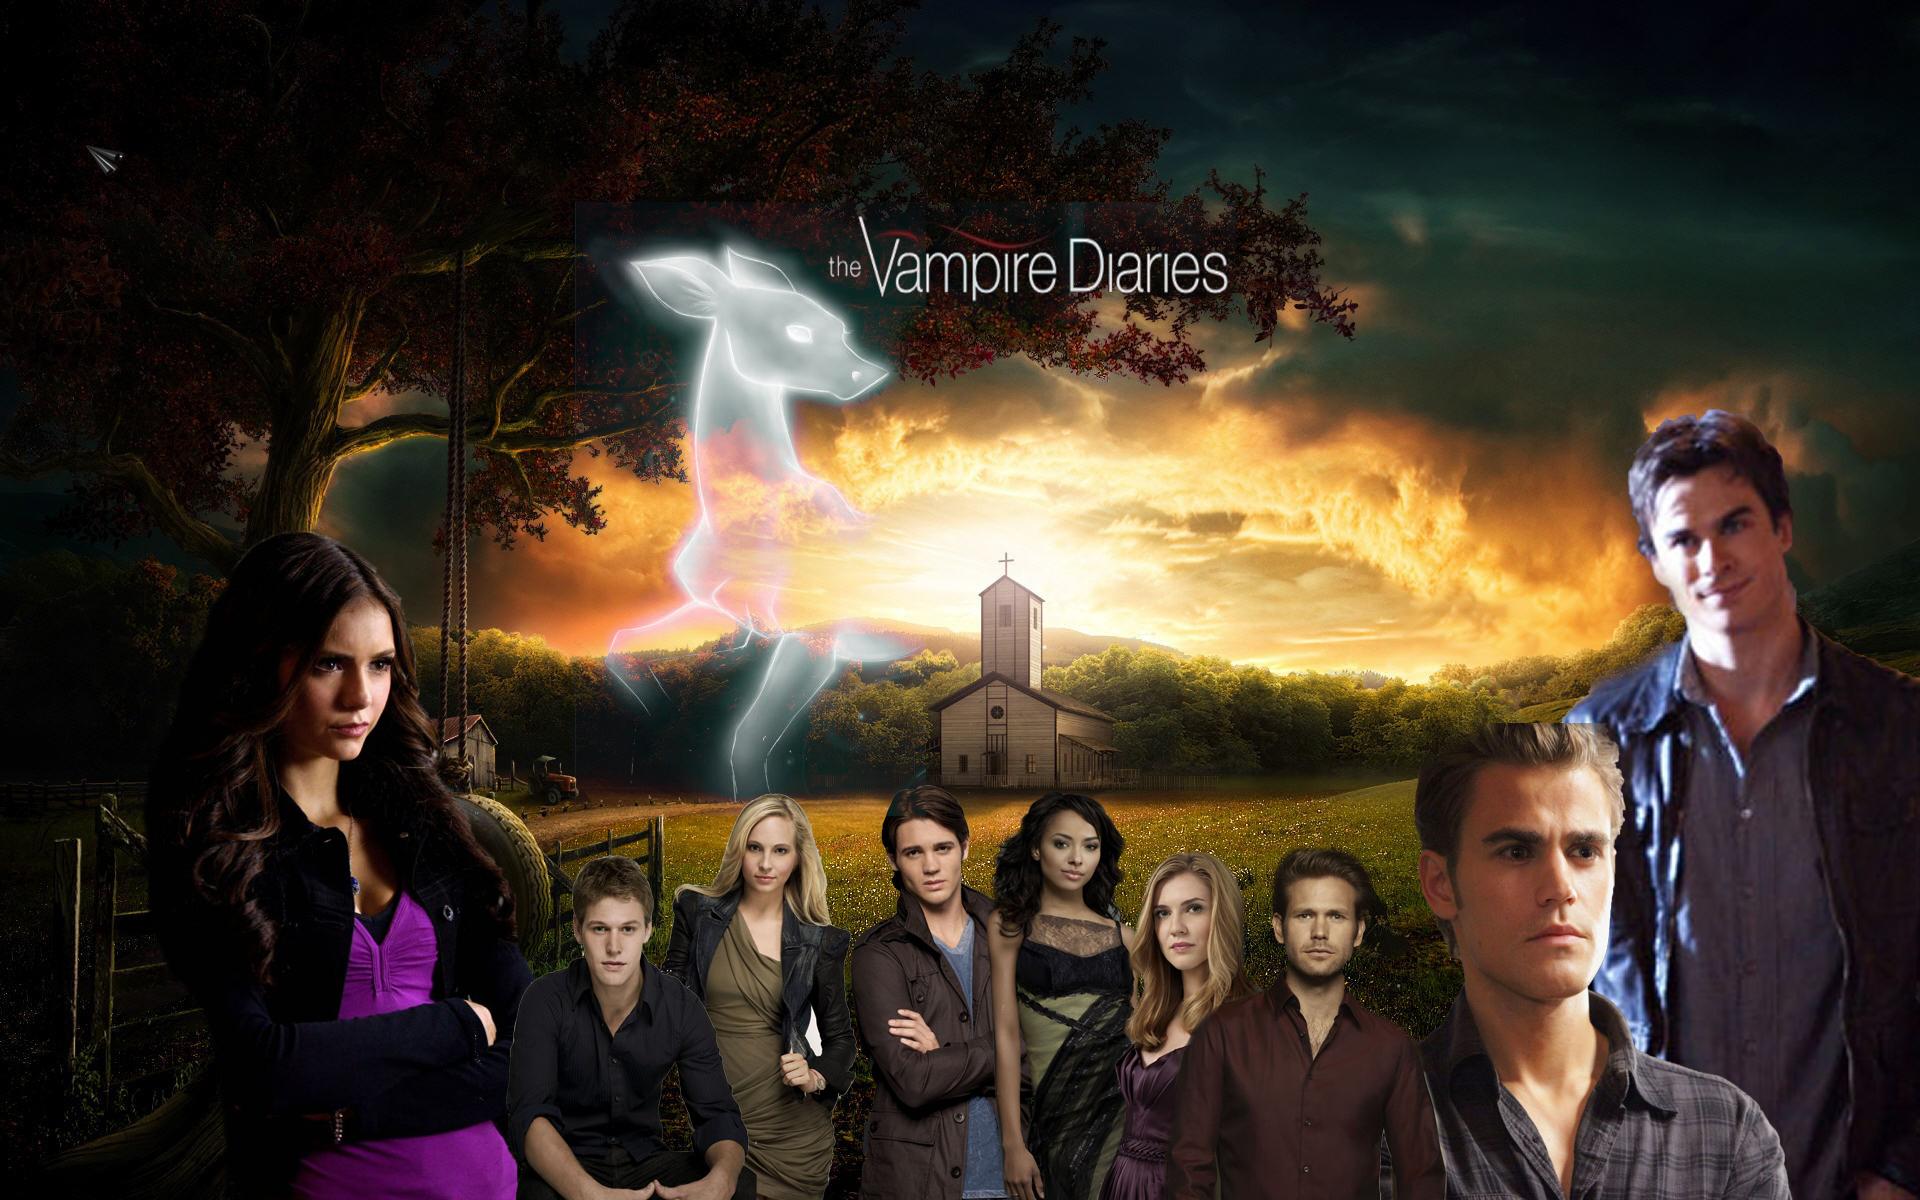 vampire diaries characters - HD1920×1200